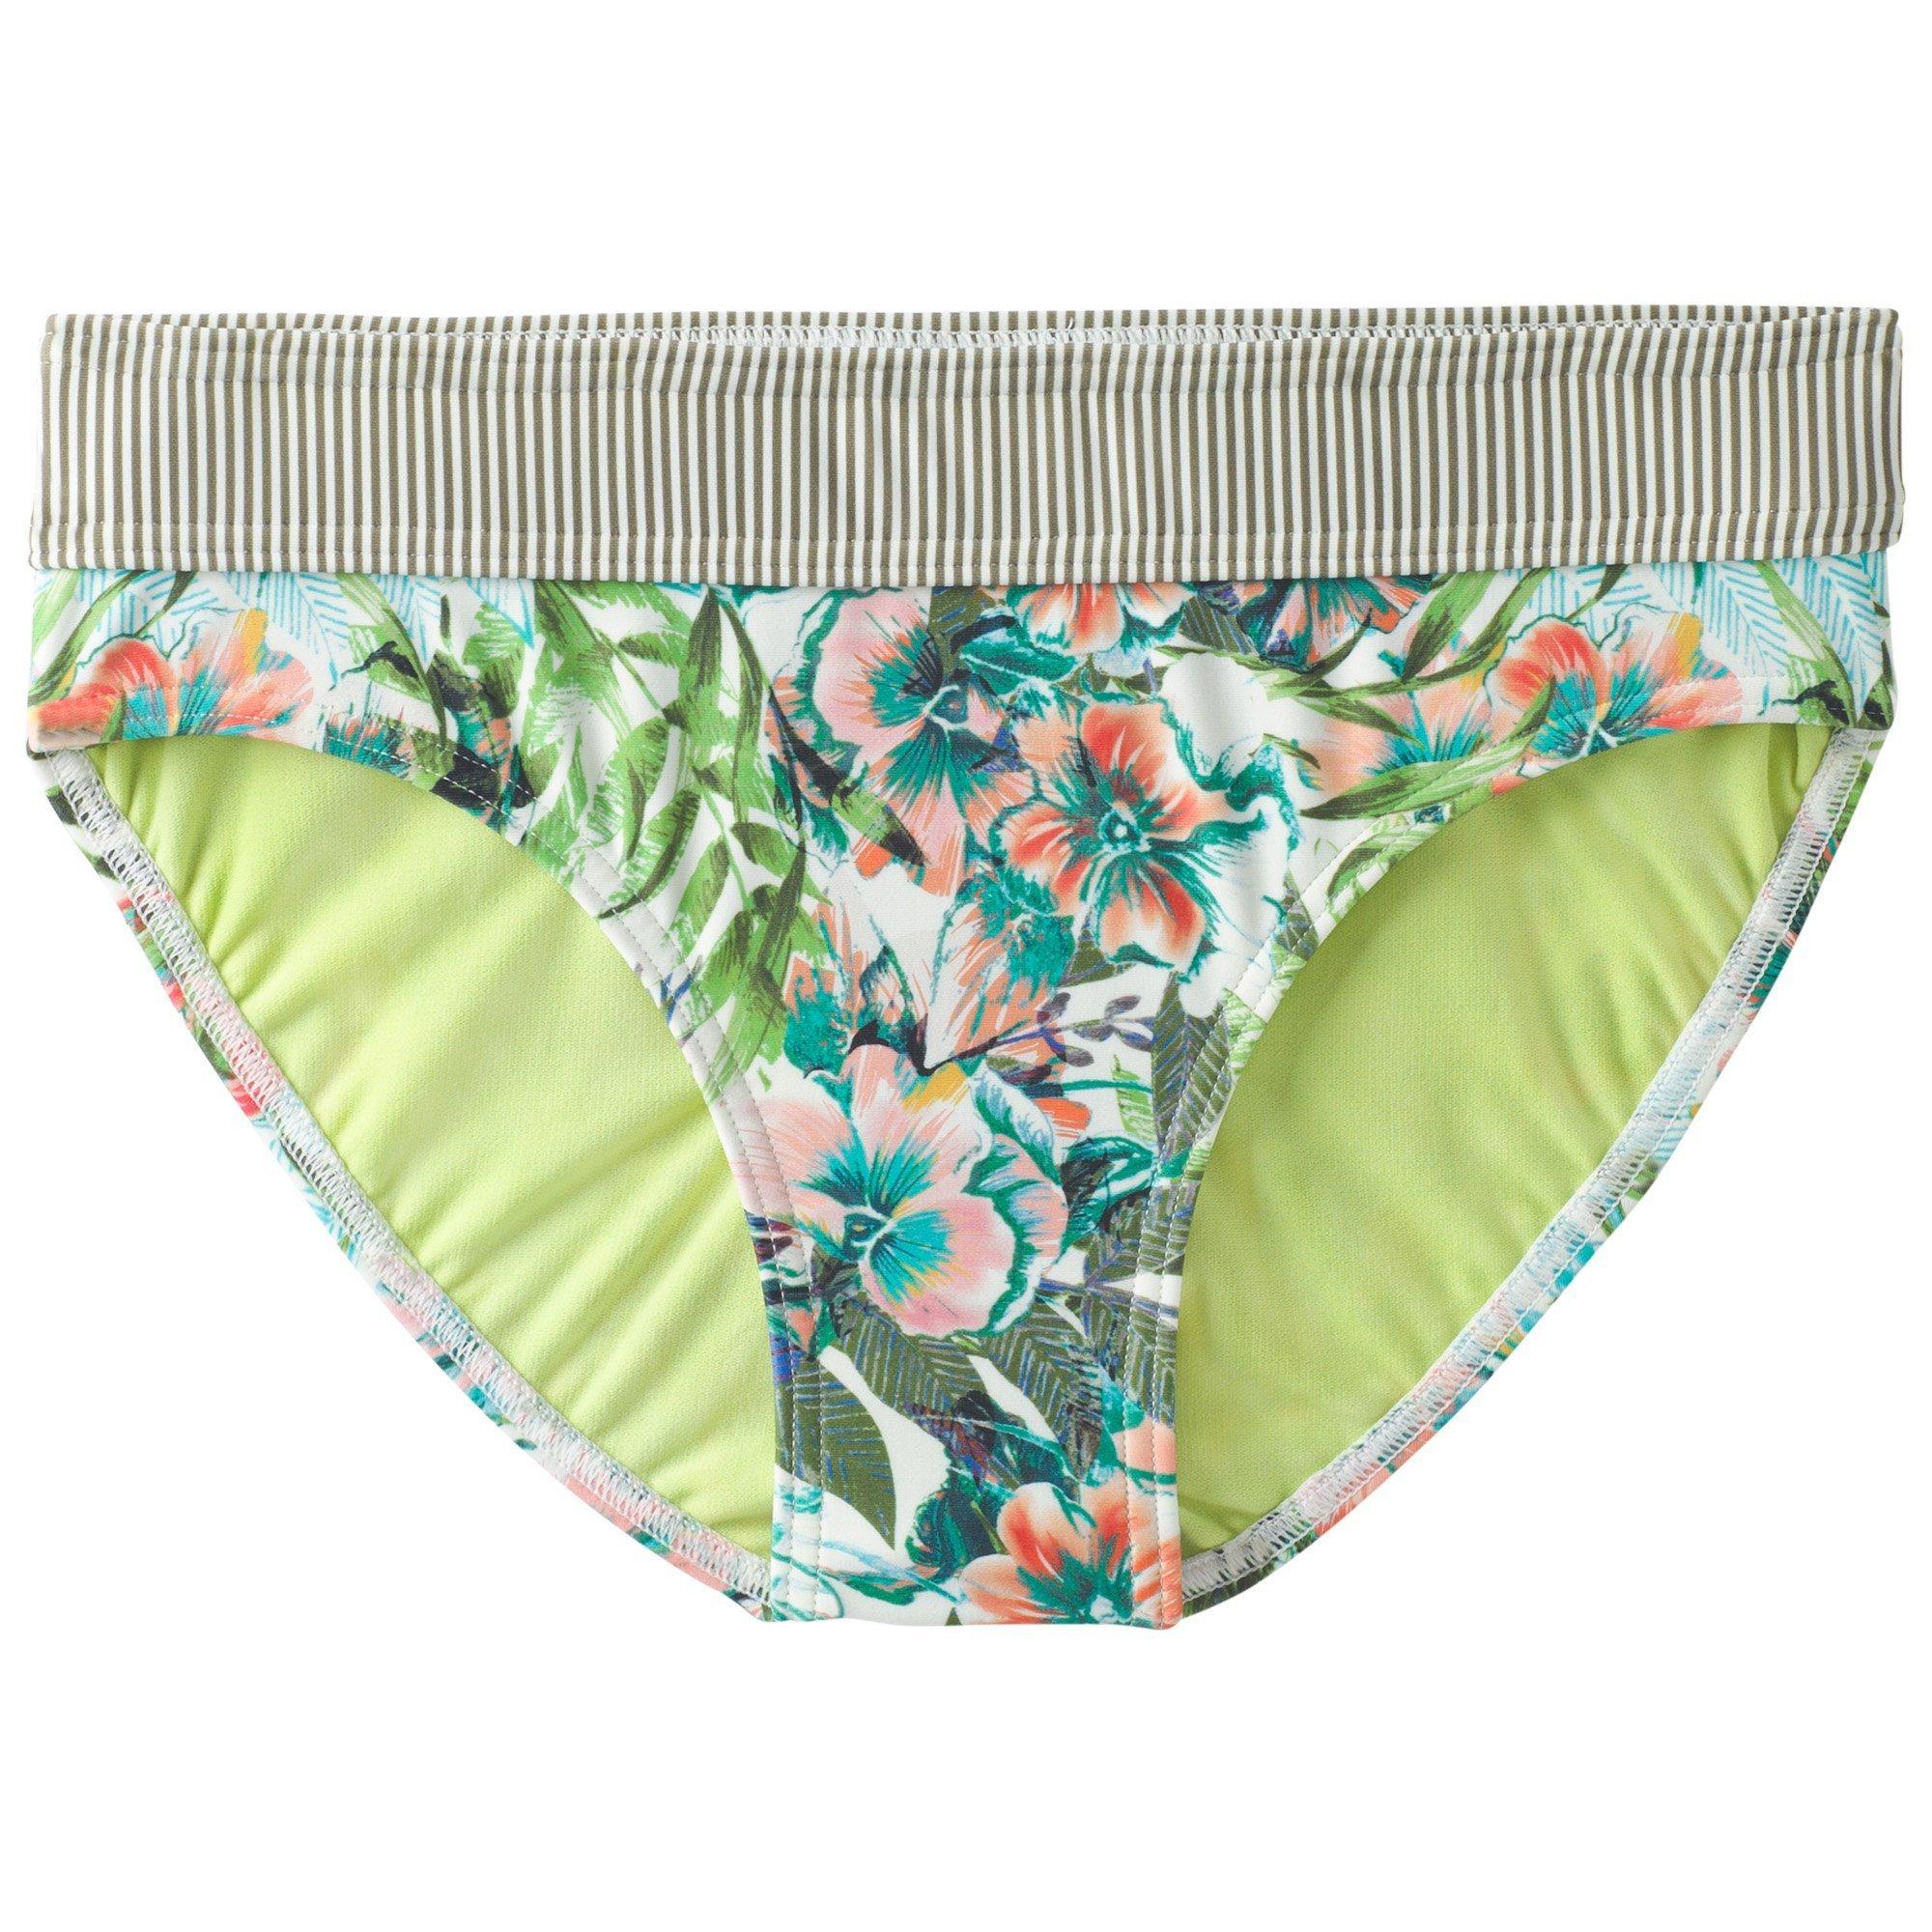 prAna Women's Ramba Bottom Athletic Shorts, X-Large, Cargo Green Bali